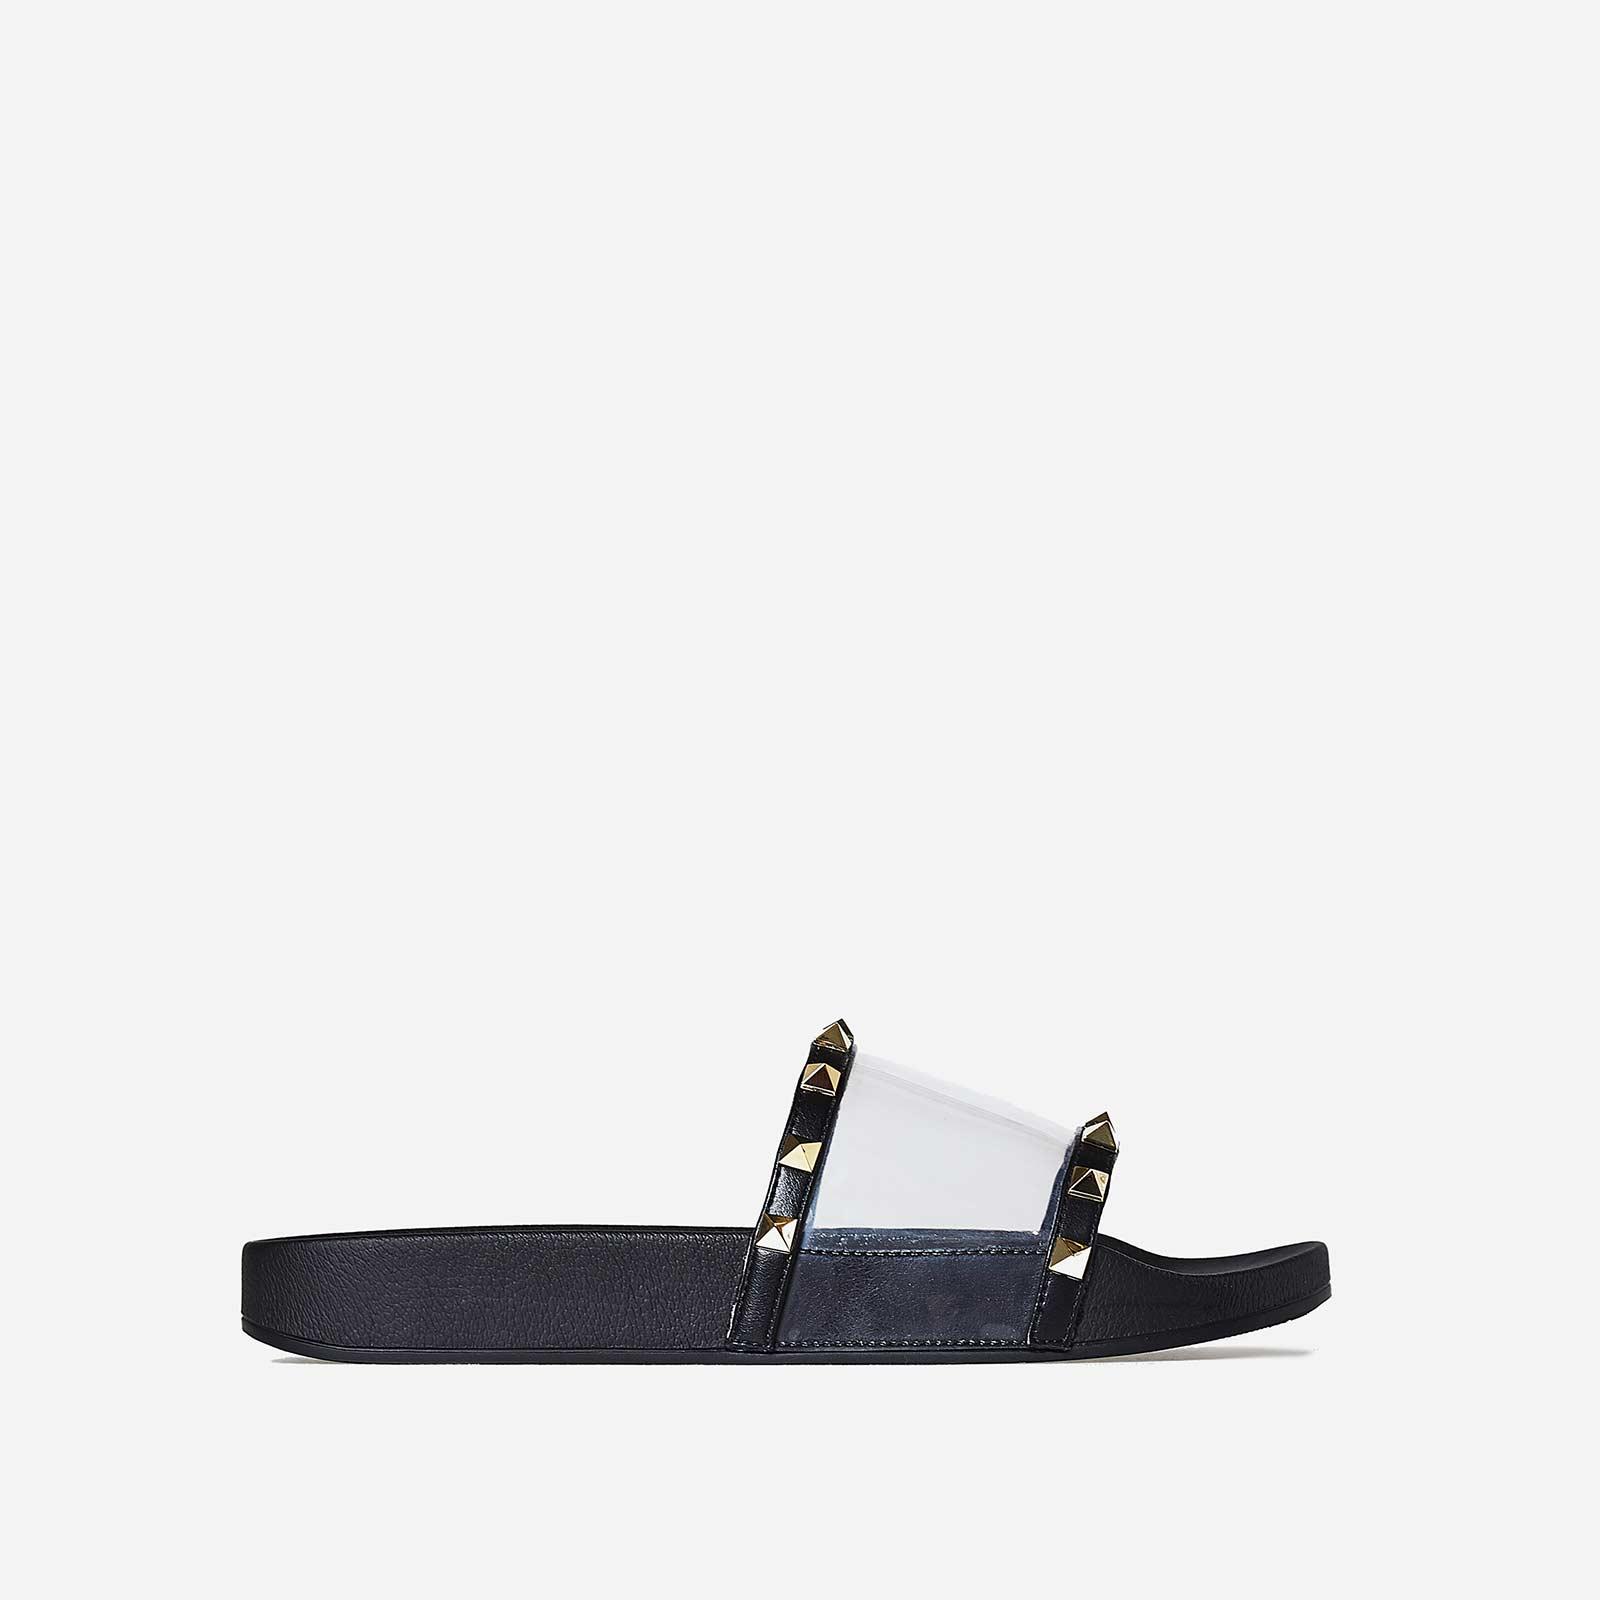 Ora Studded Detail Perspex Slider In Black Rubber